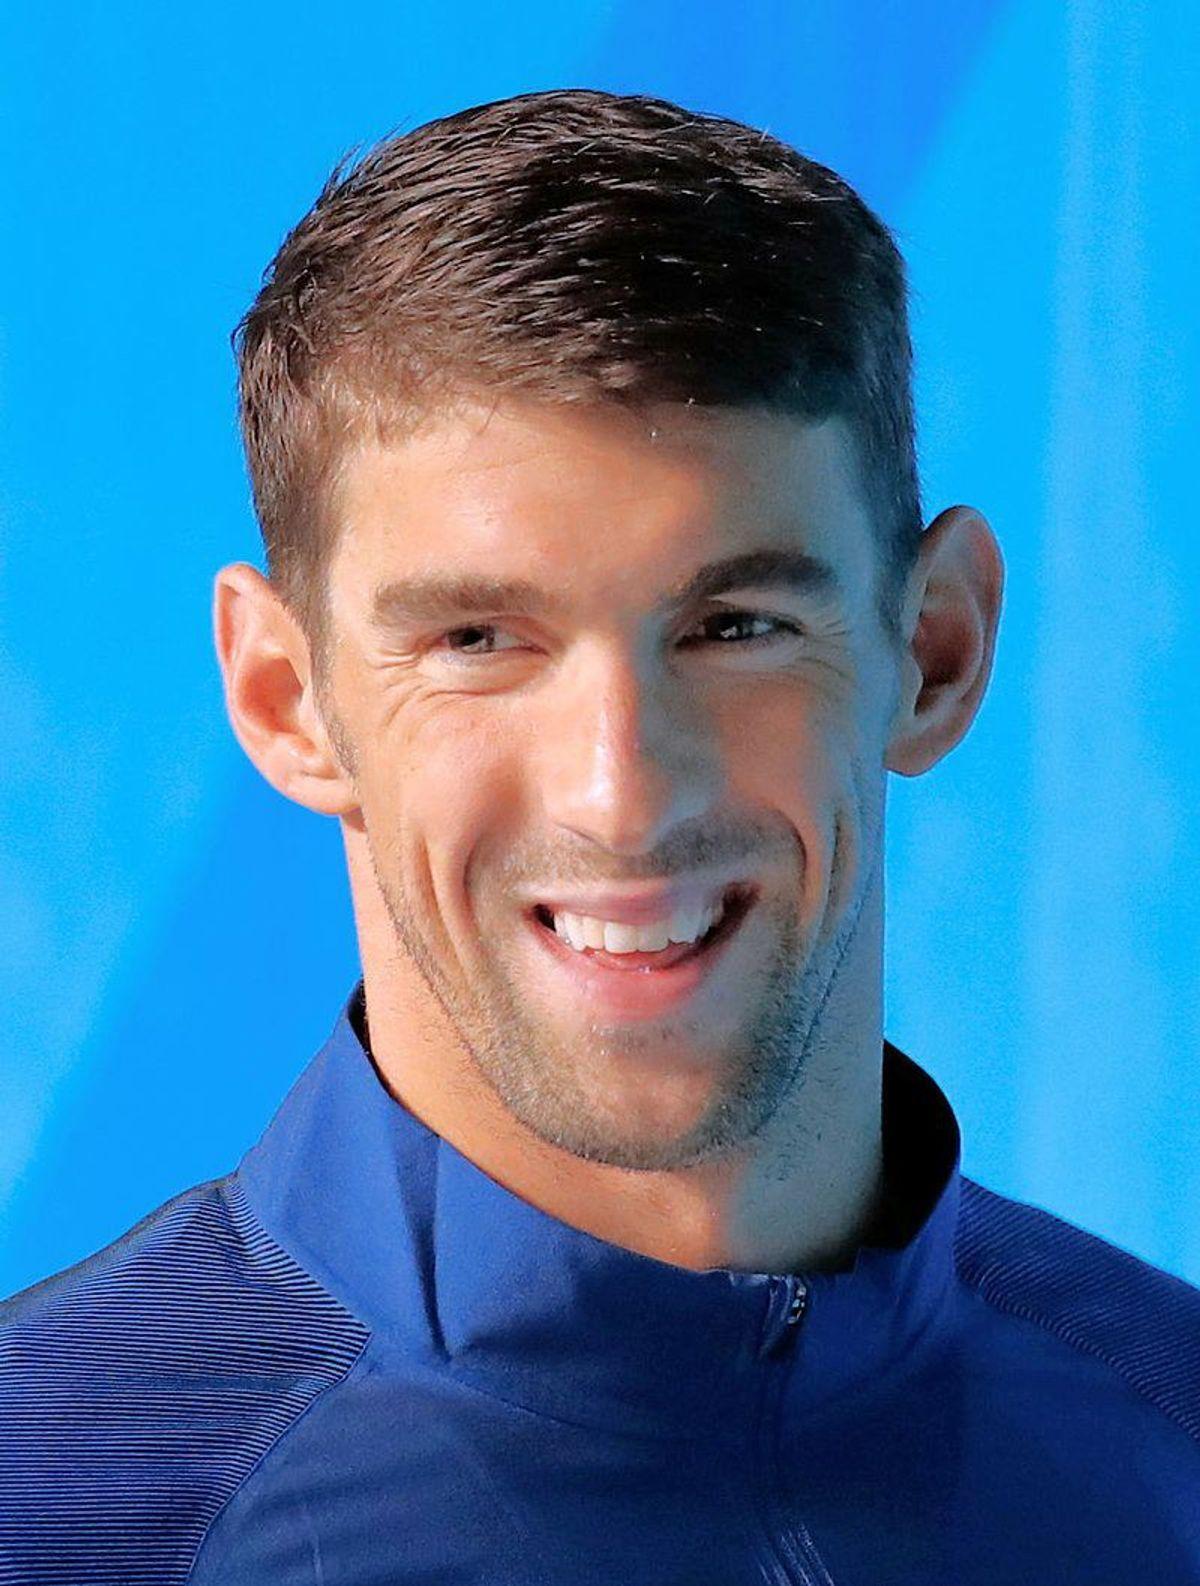 Michael Phelps: The Goat?